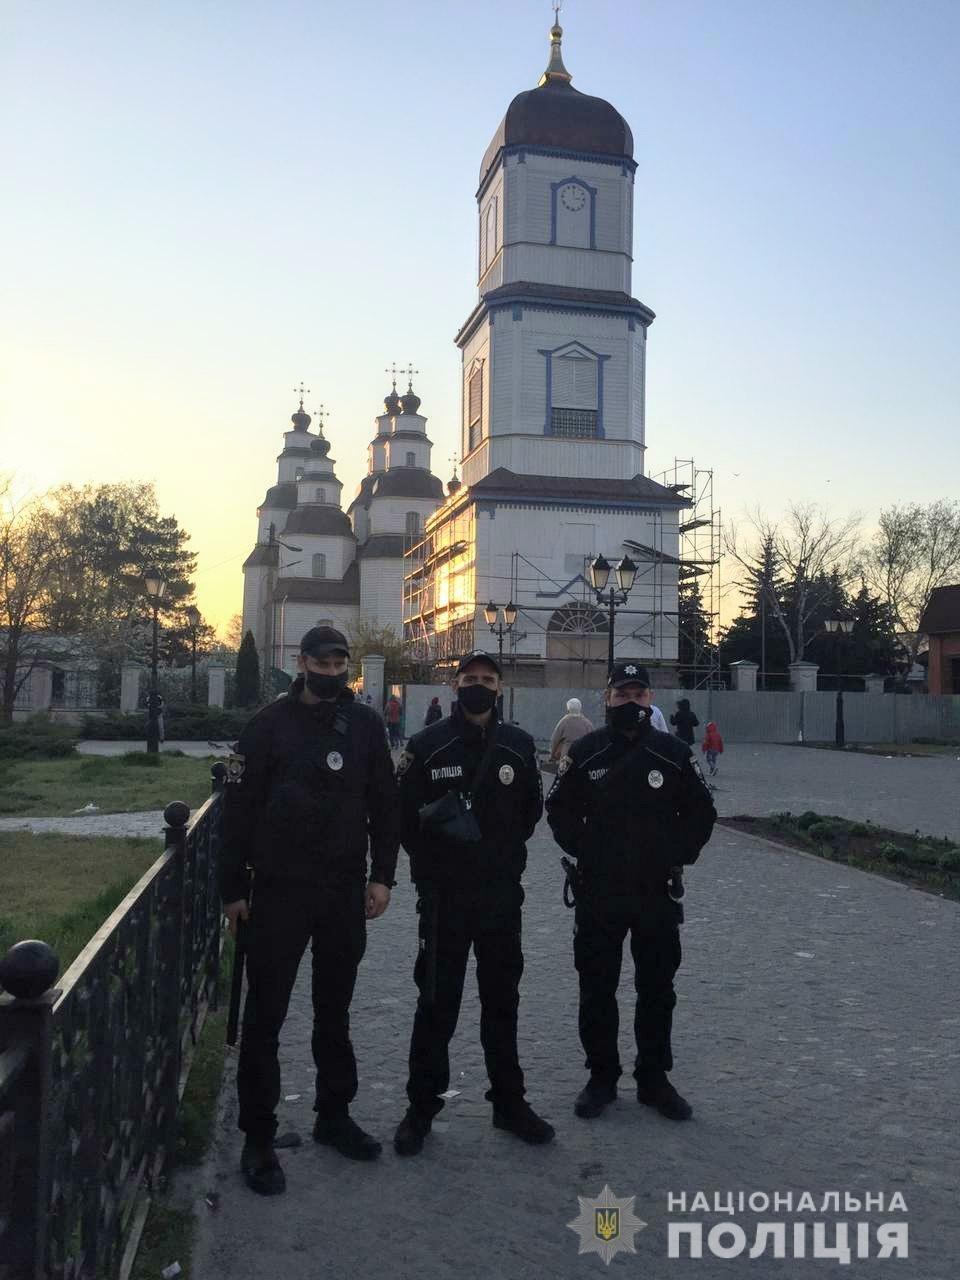 На Пасху на Днепропетровщине полицейские зафиксировали 3 нарушения карантинных норм в храмах, - ФОТО  , фото-3